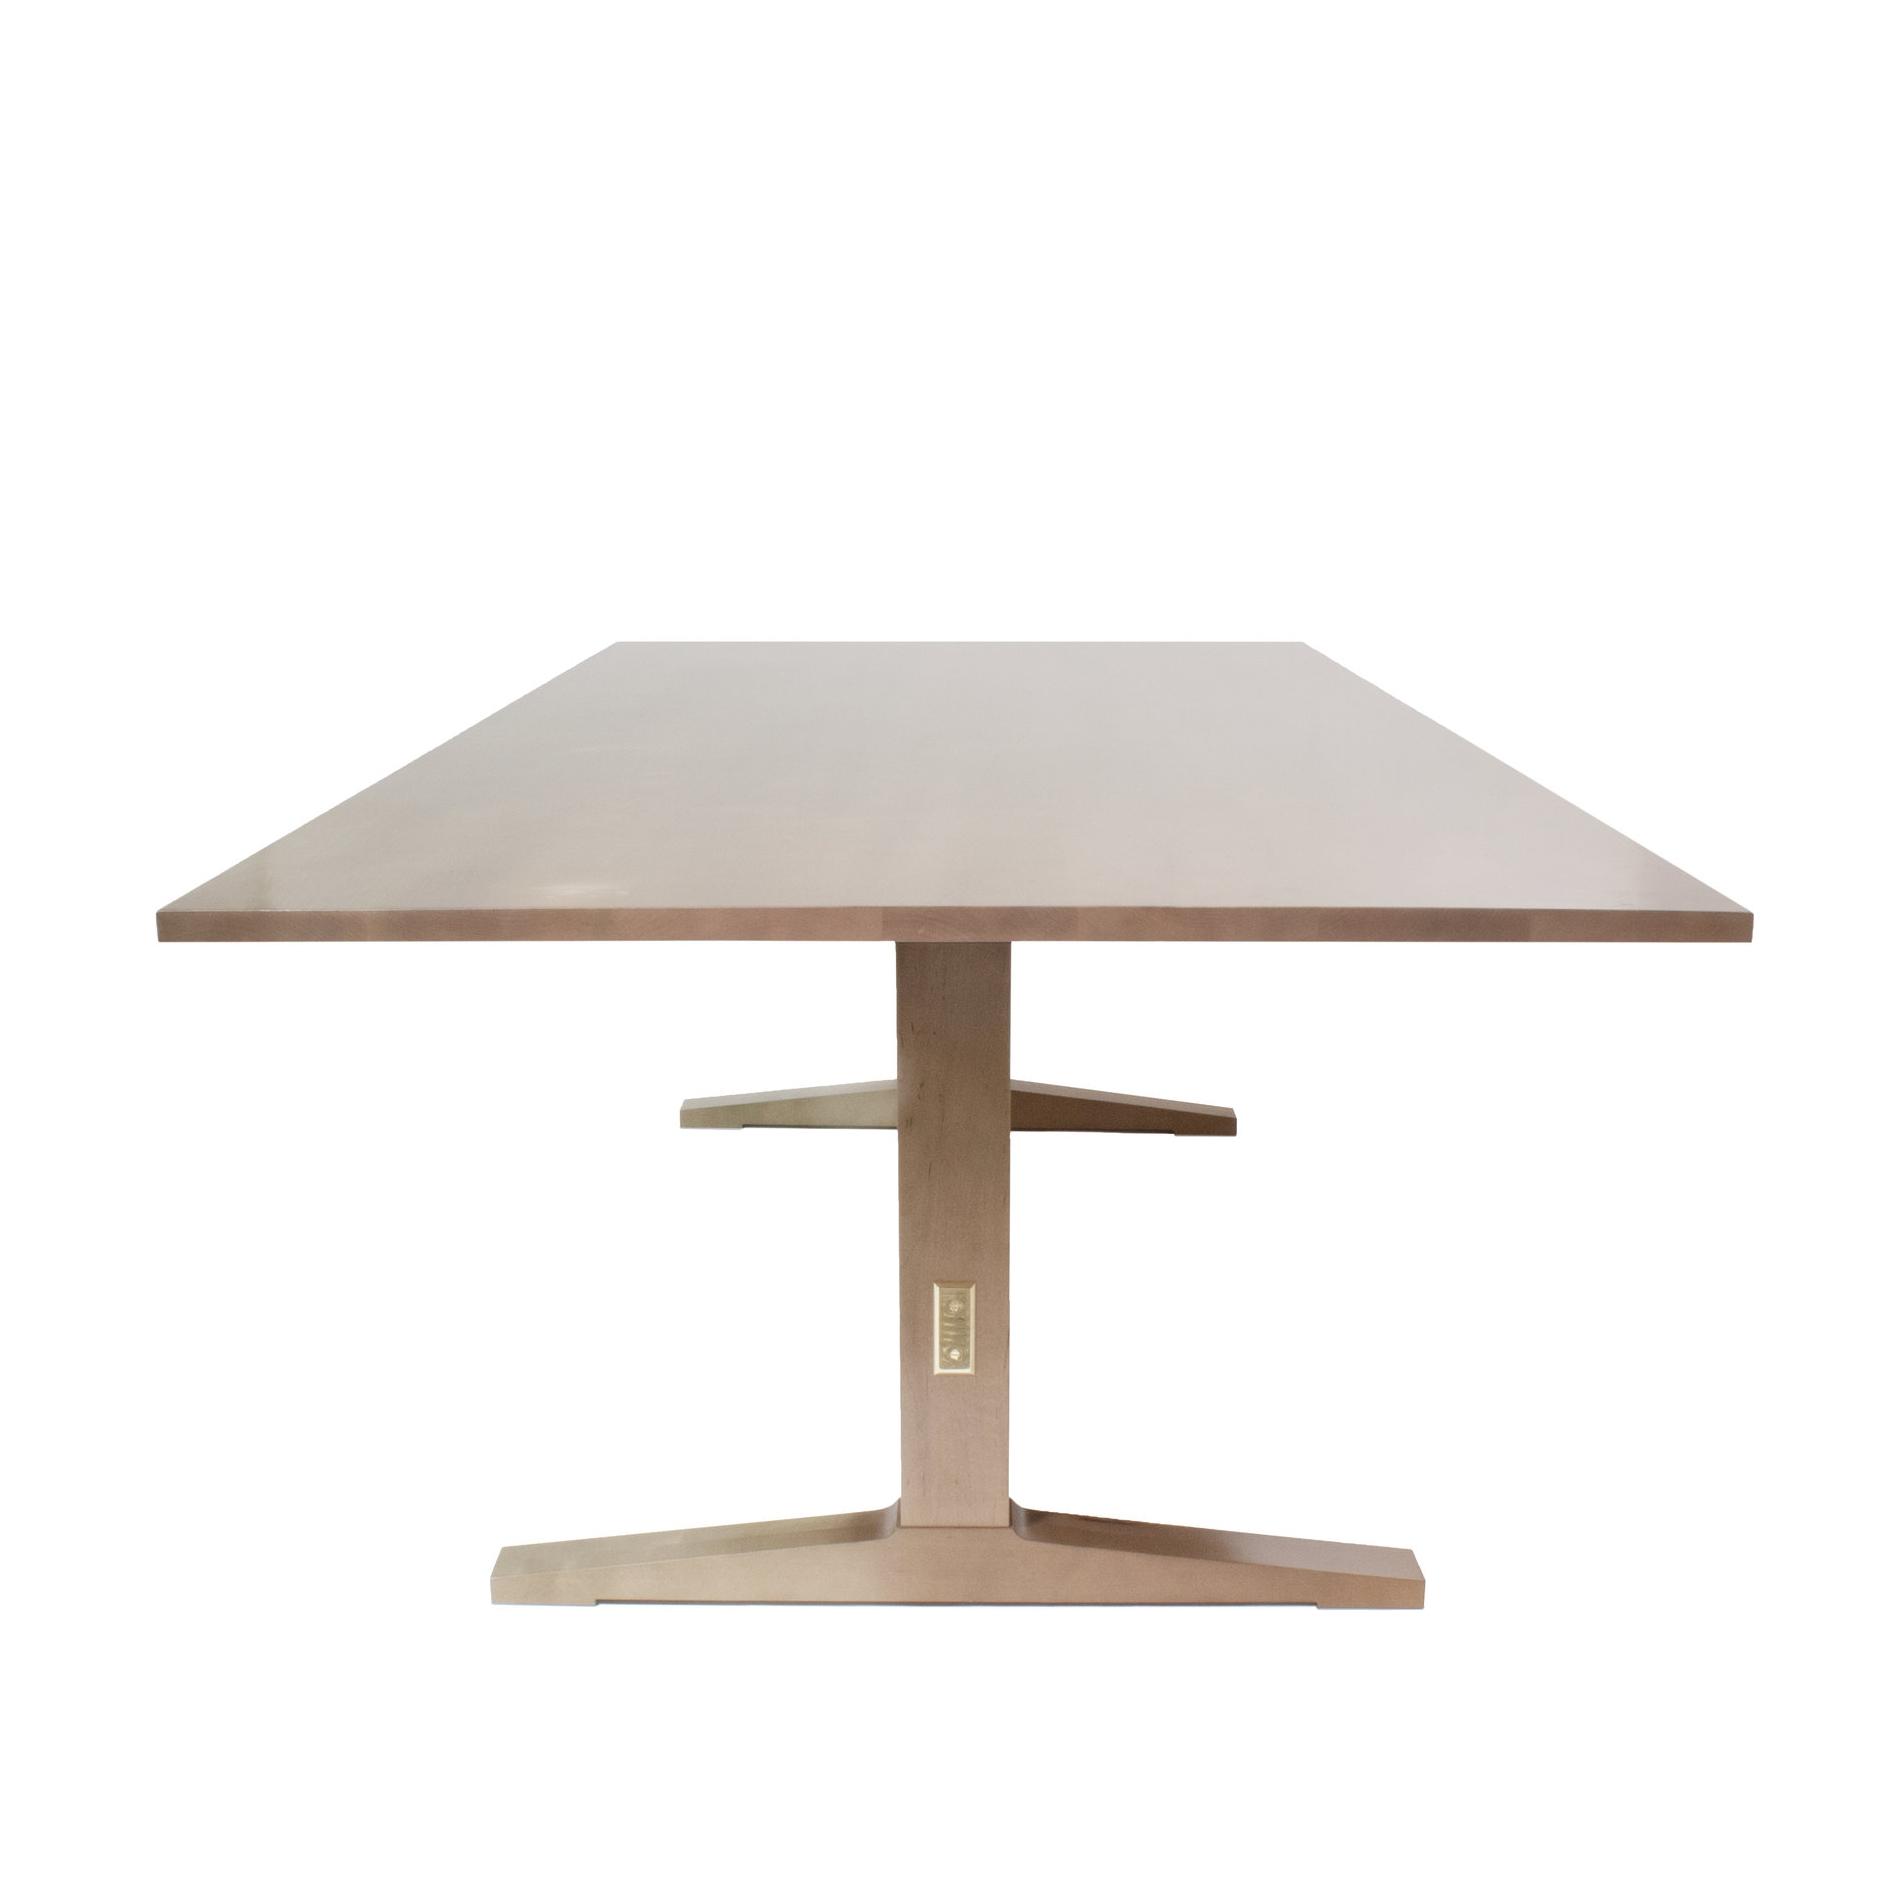 _ACRE_TRESTLE_TABLE_RECTANGLE_FRONT_45x96.jpg